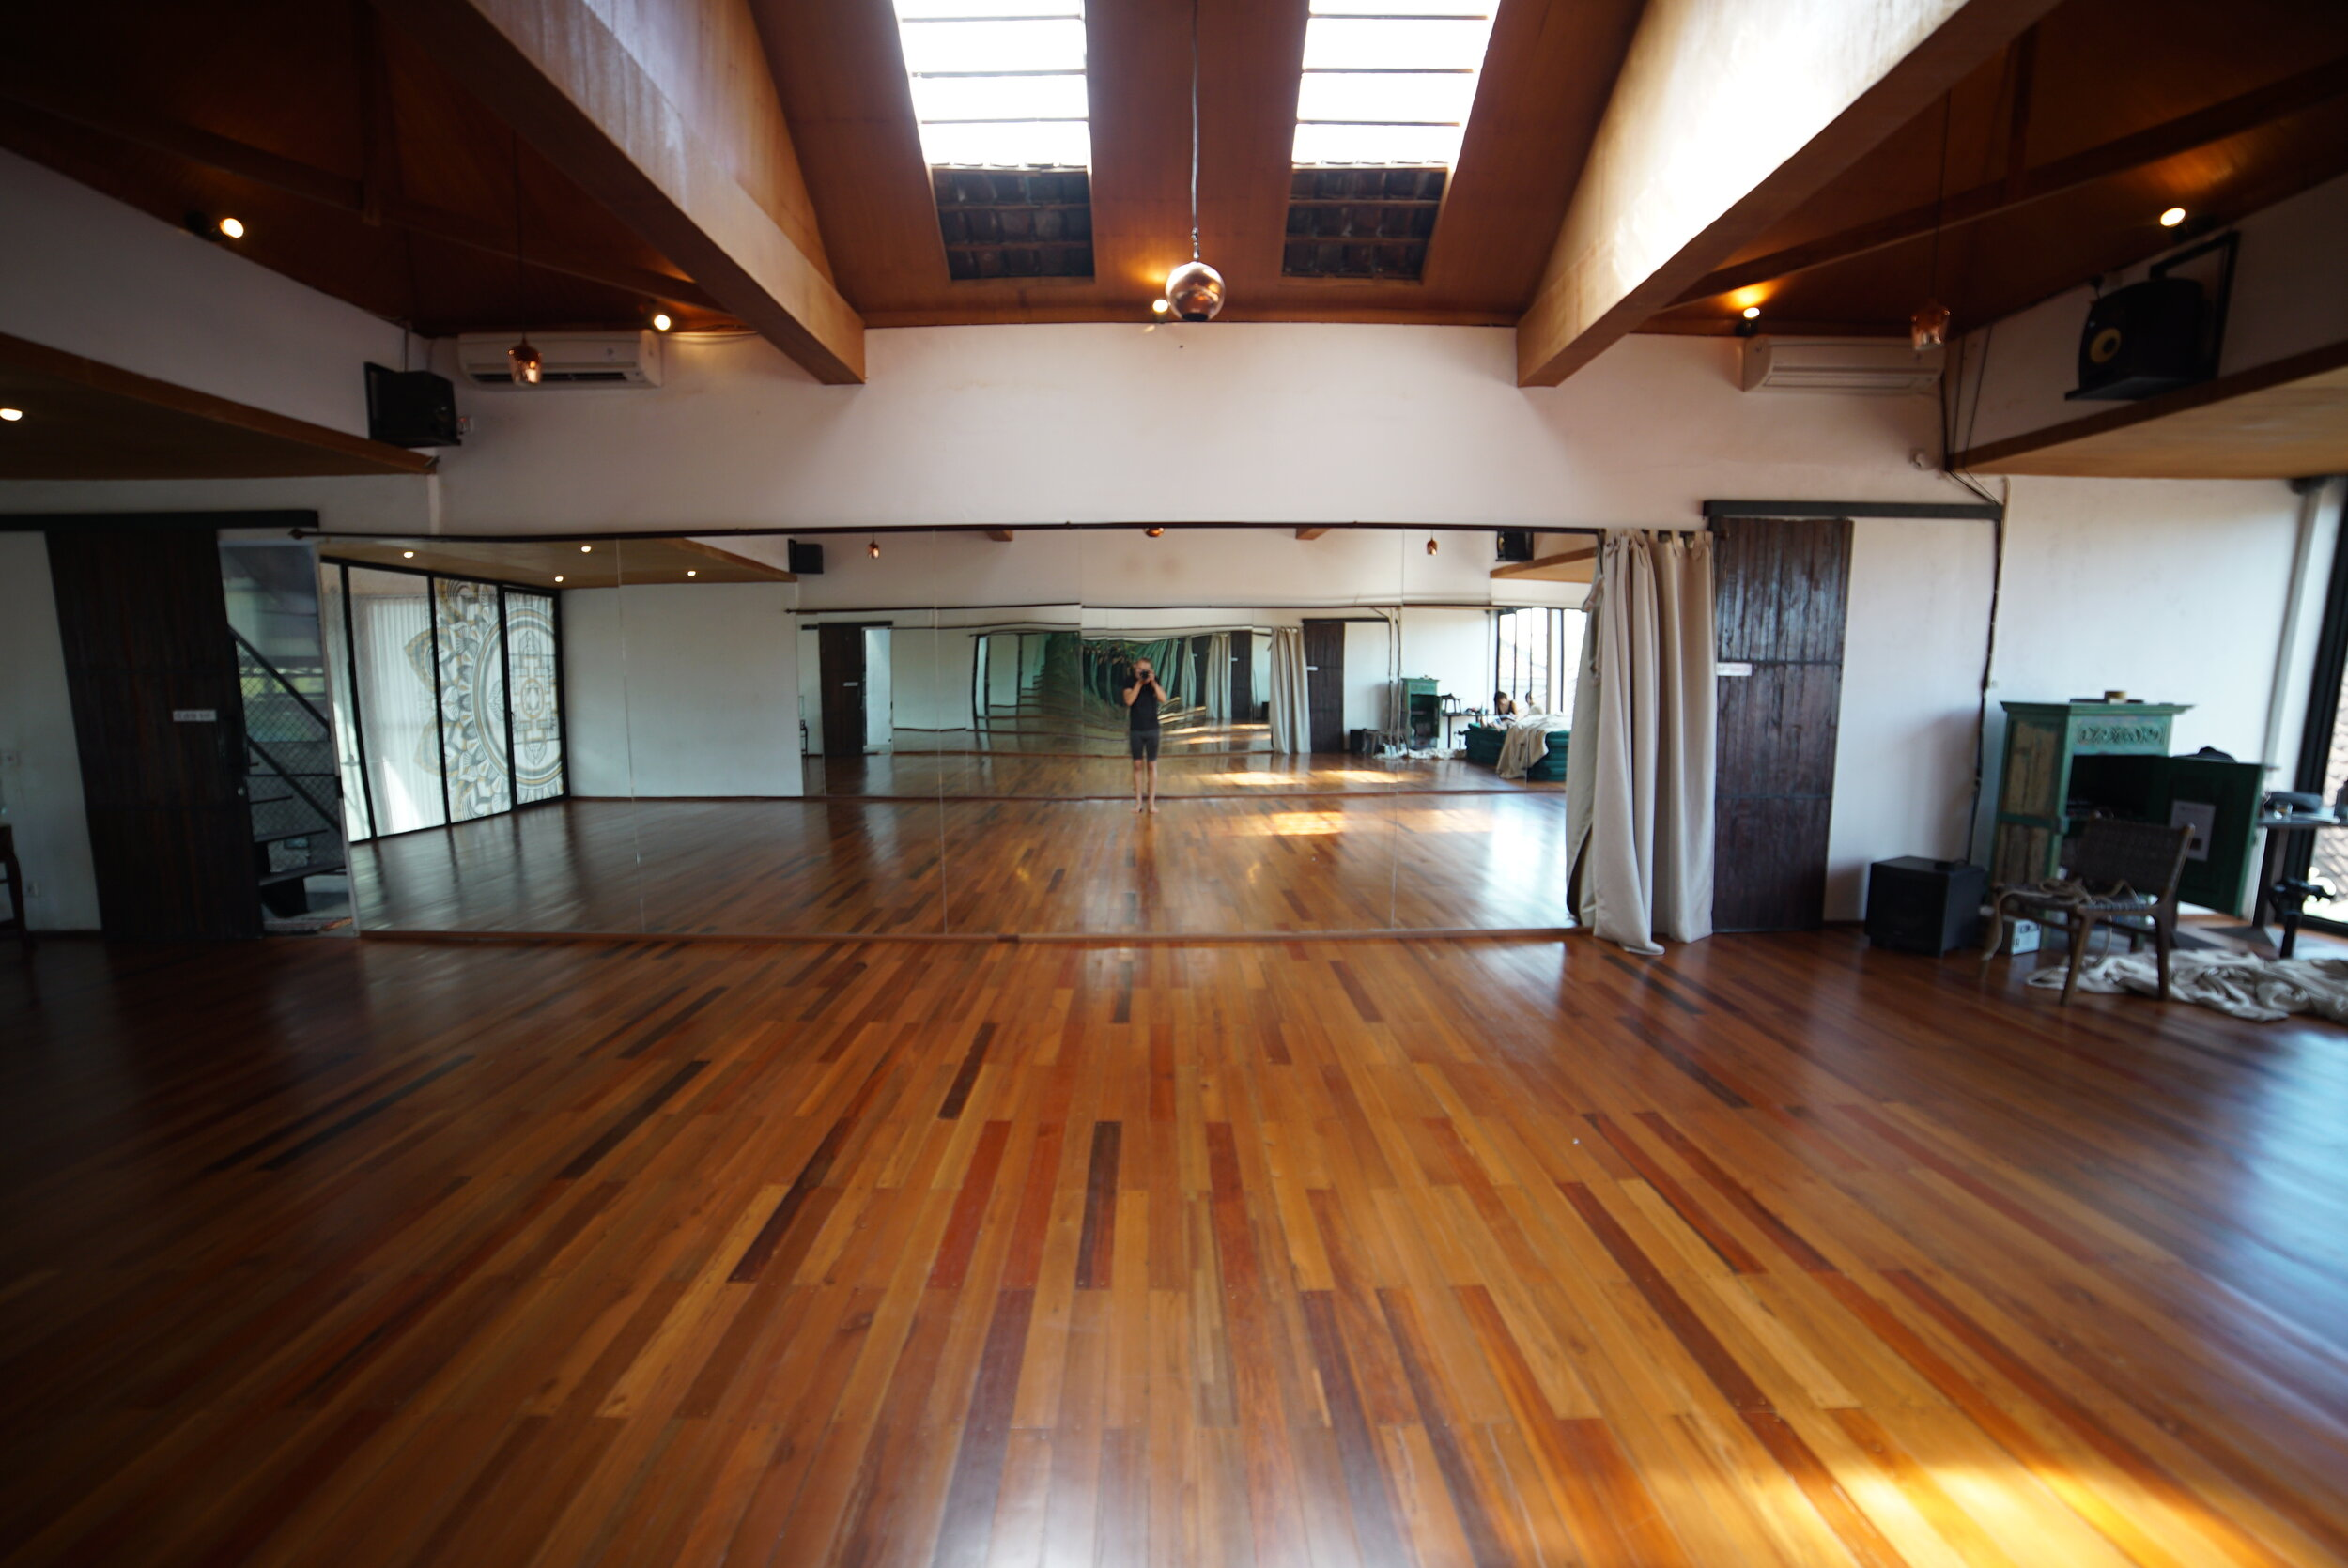 2019_05_04_Karma_House_Yoga_A7sii_48.JPG